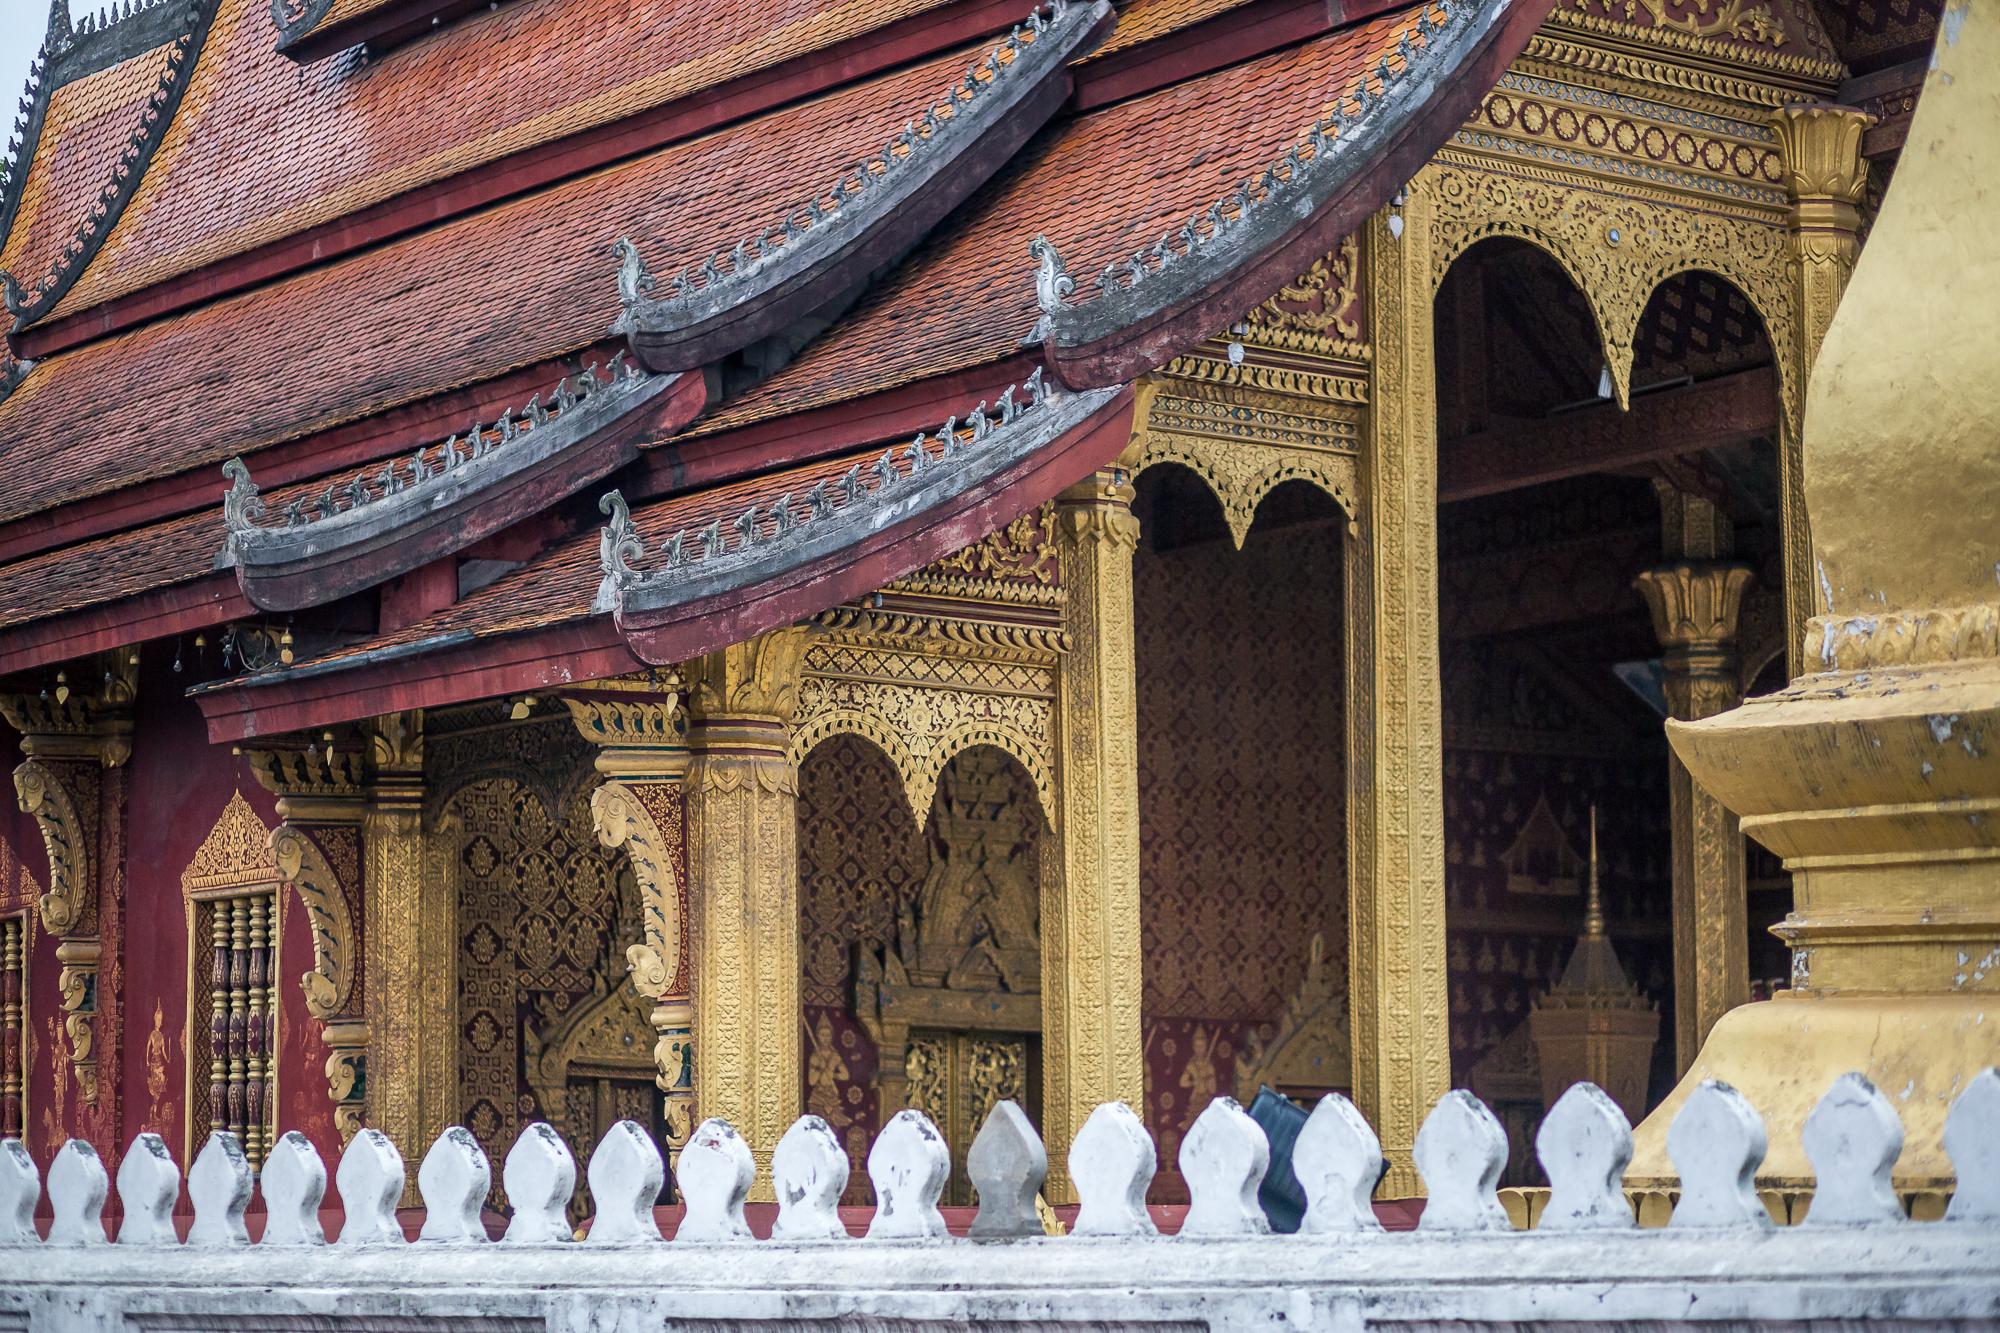 LAOS_Honeymoon_TheOutsiderBlog_IND42884.JPG